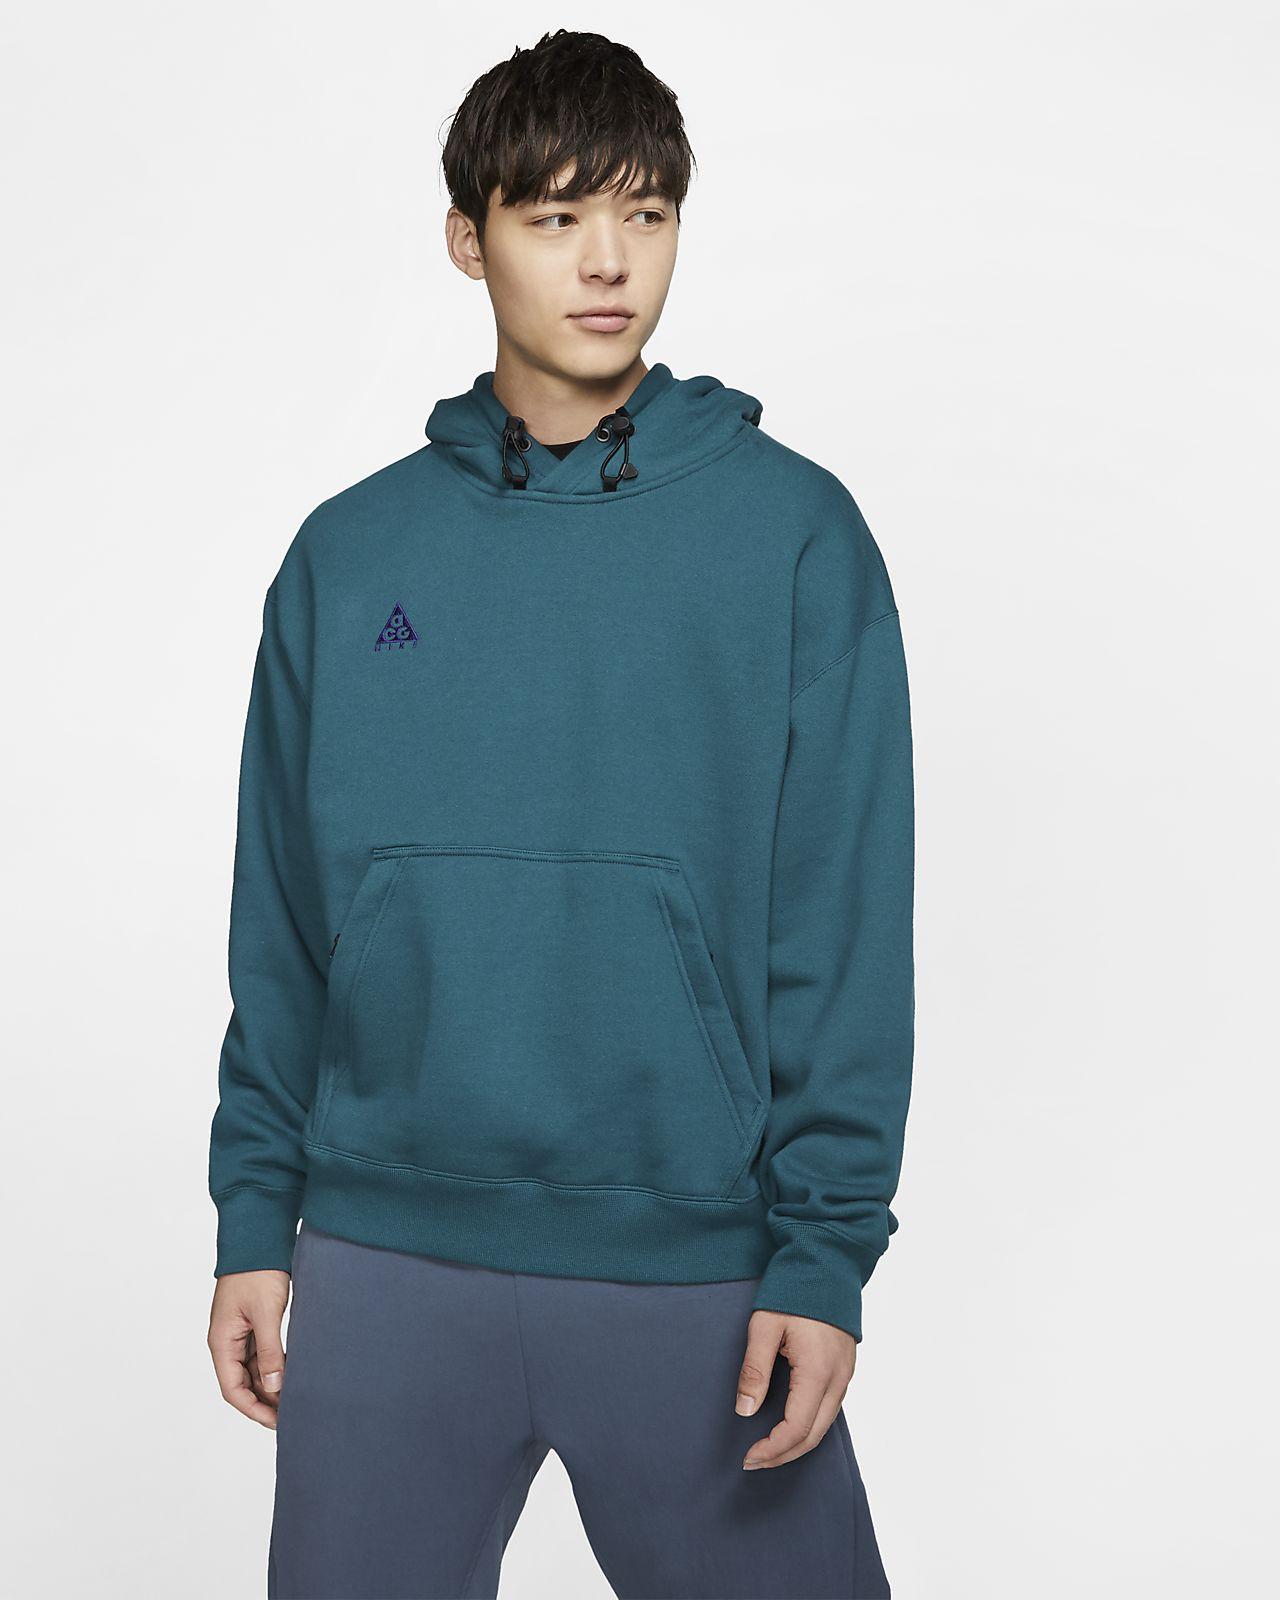 Bluza z kapturem Nike ACG